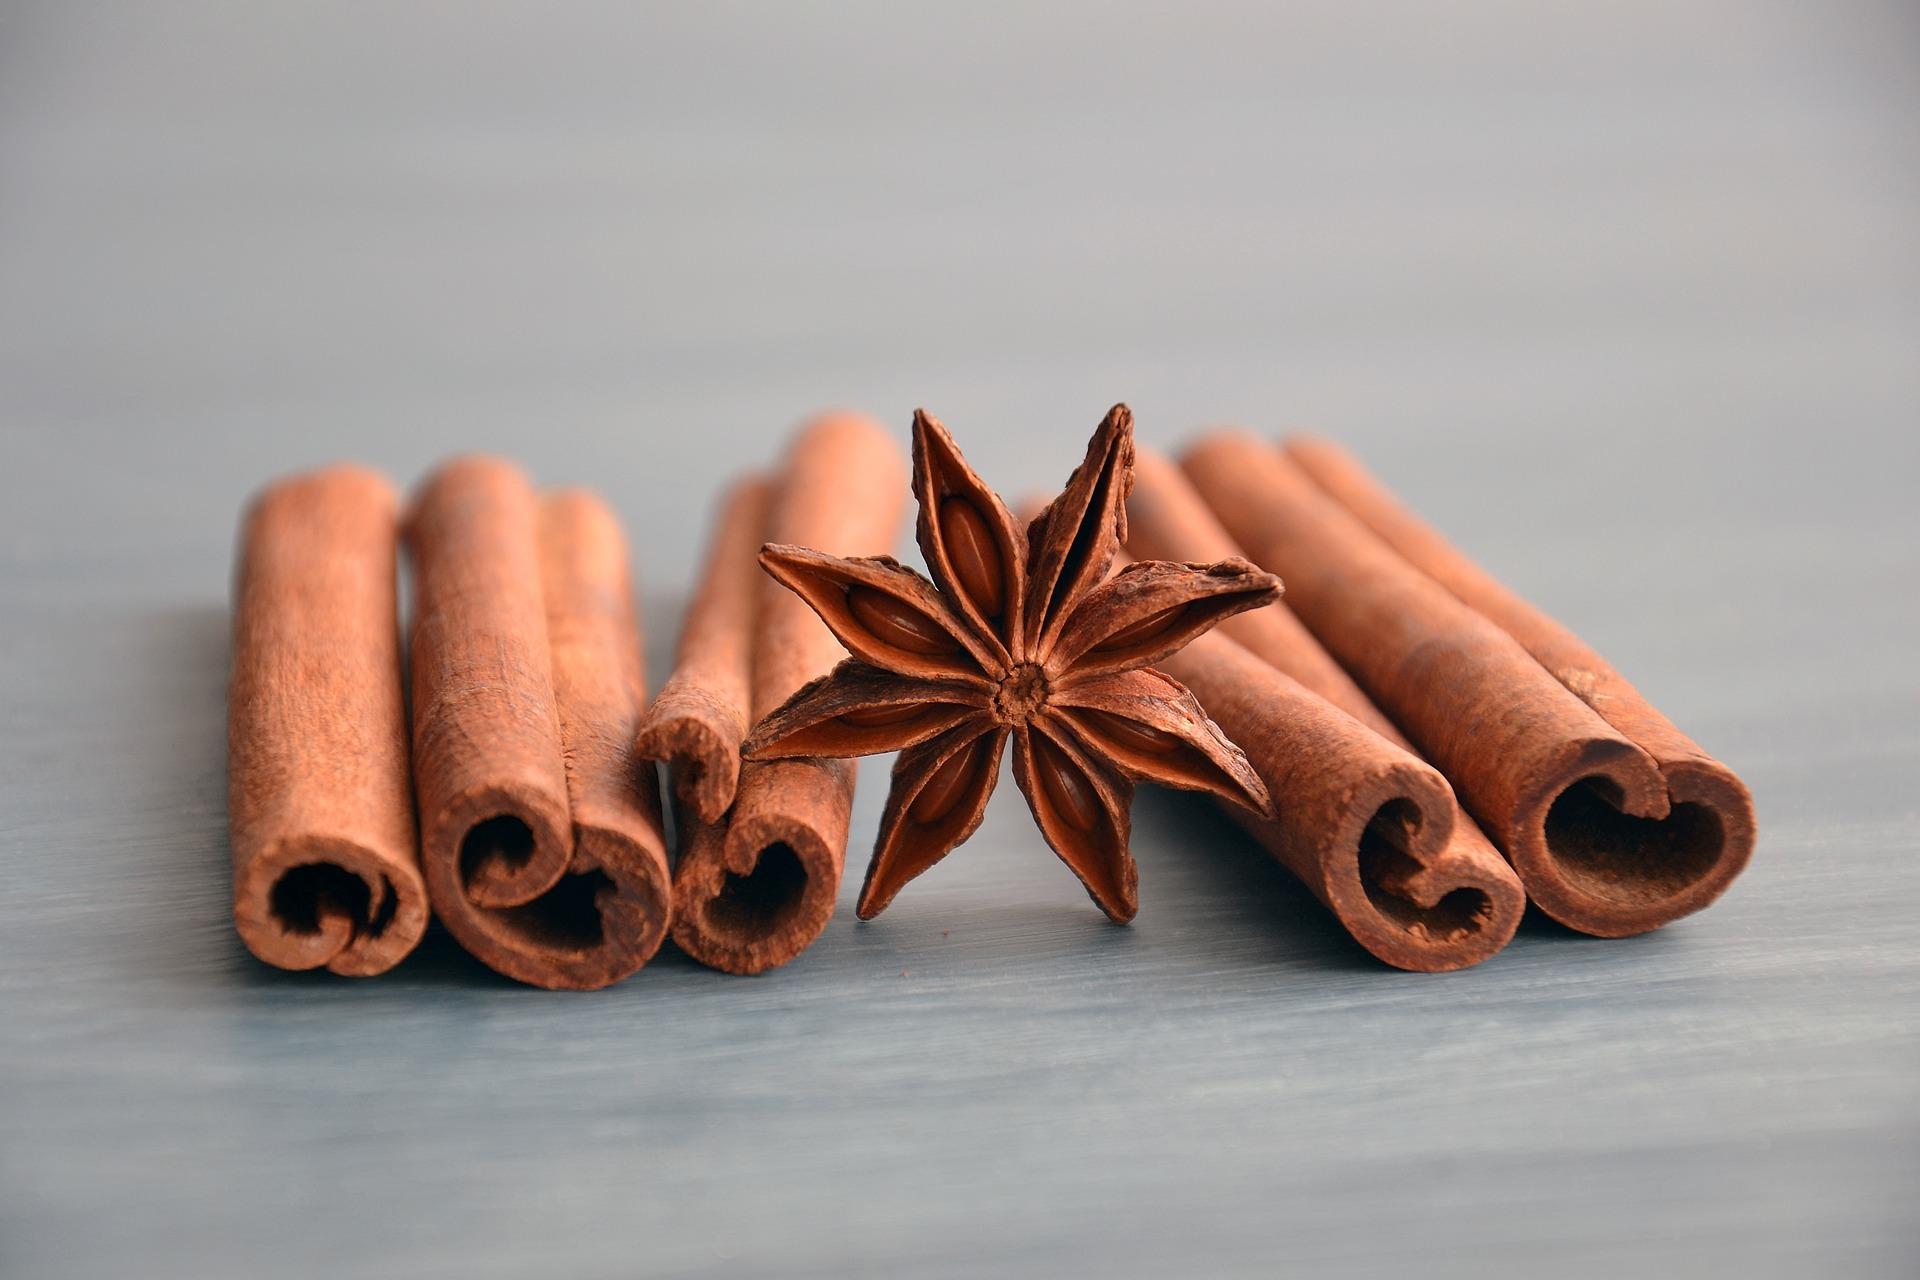 Cinnamon may be a good sugar alternative